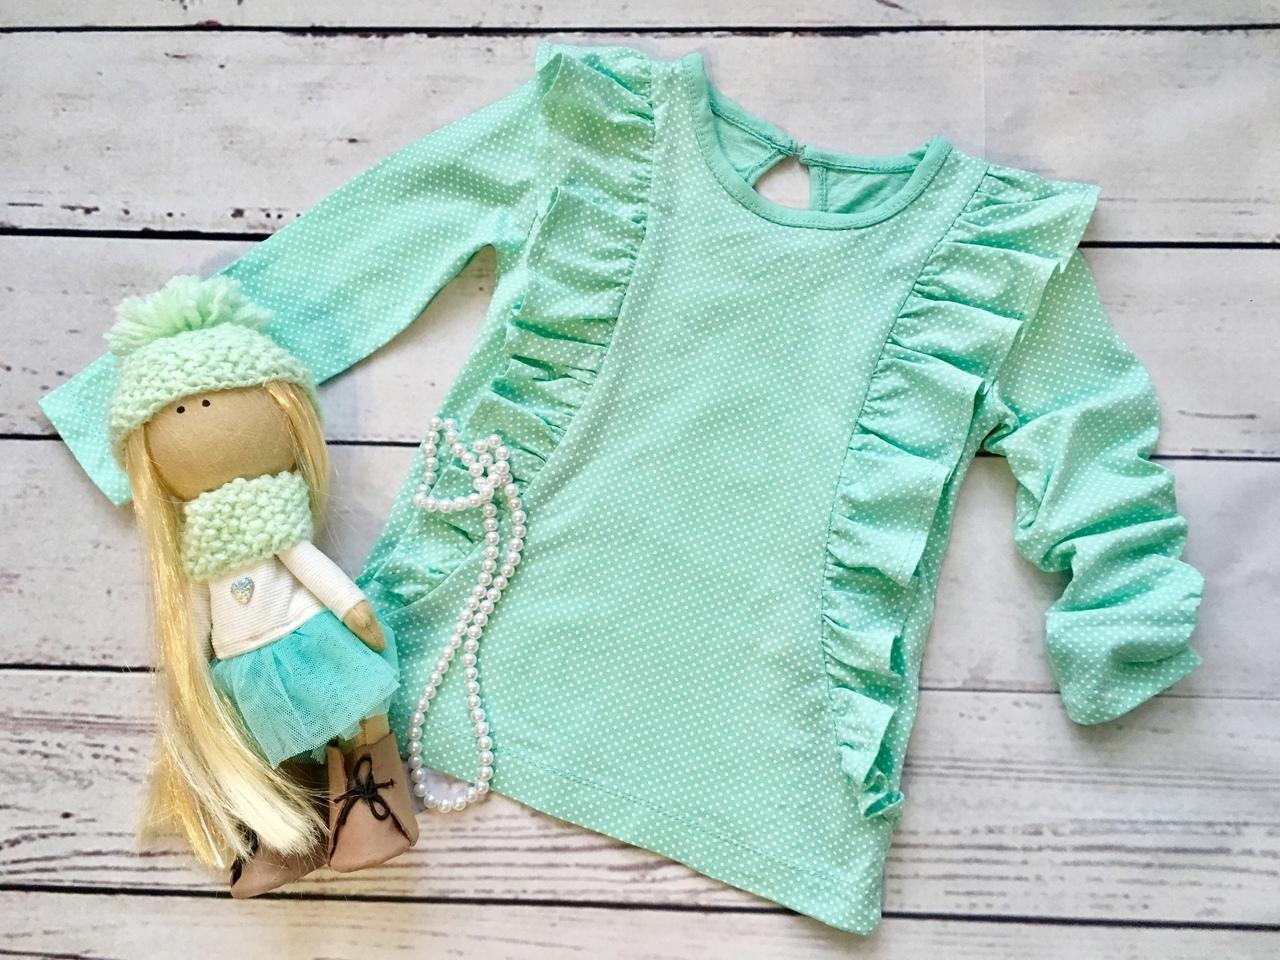 Long Sleeve Ruffle T-Shirt Sewing Pattern For Girls (Sizes 86-122)